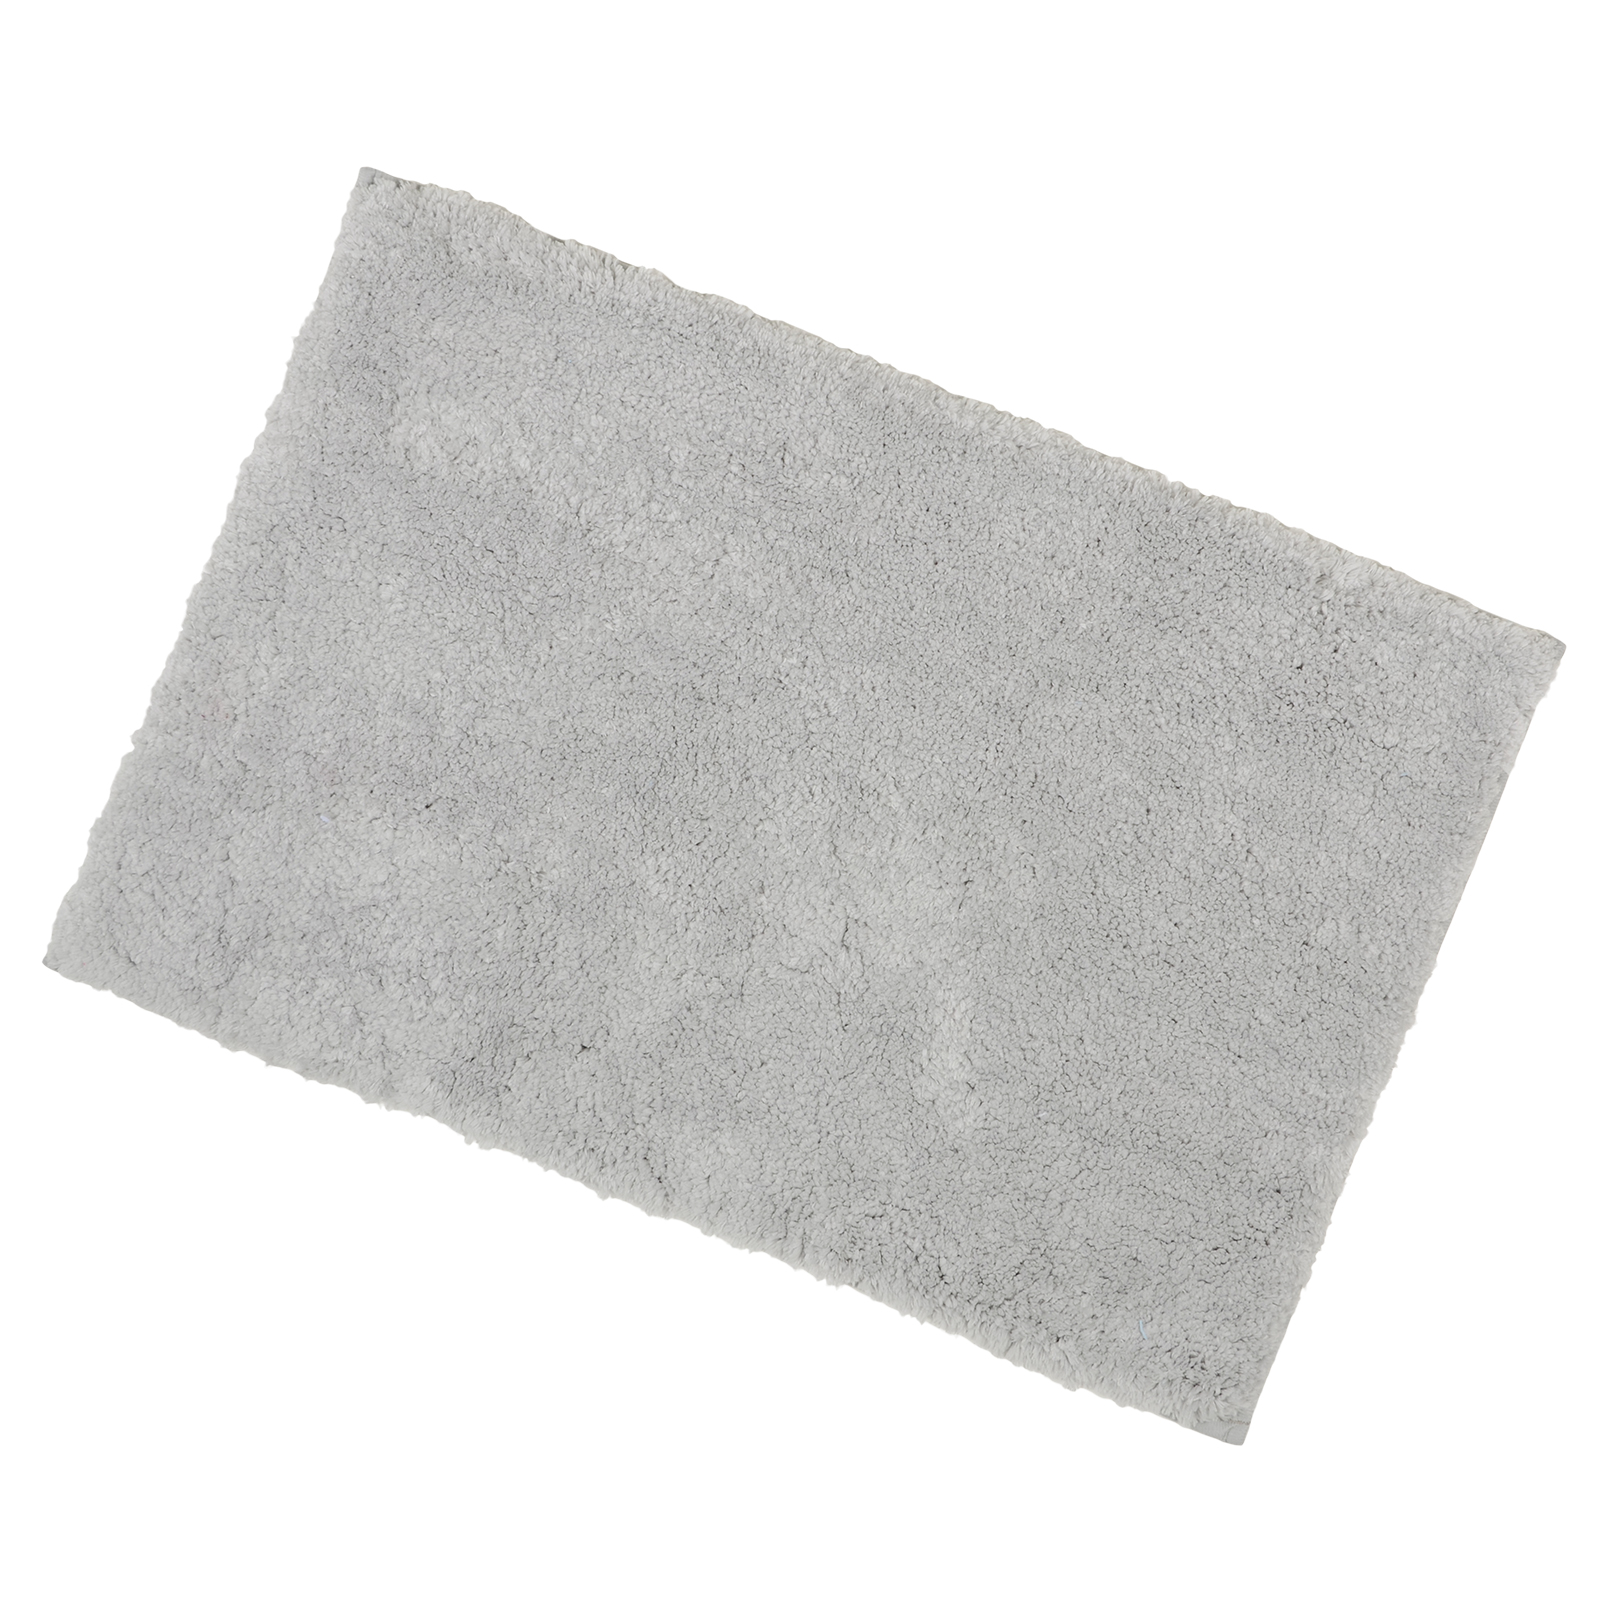 soft tufted microfibre bathroom shower bath mat rug non